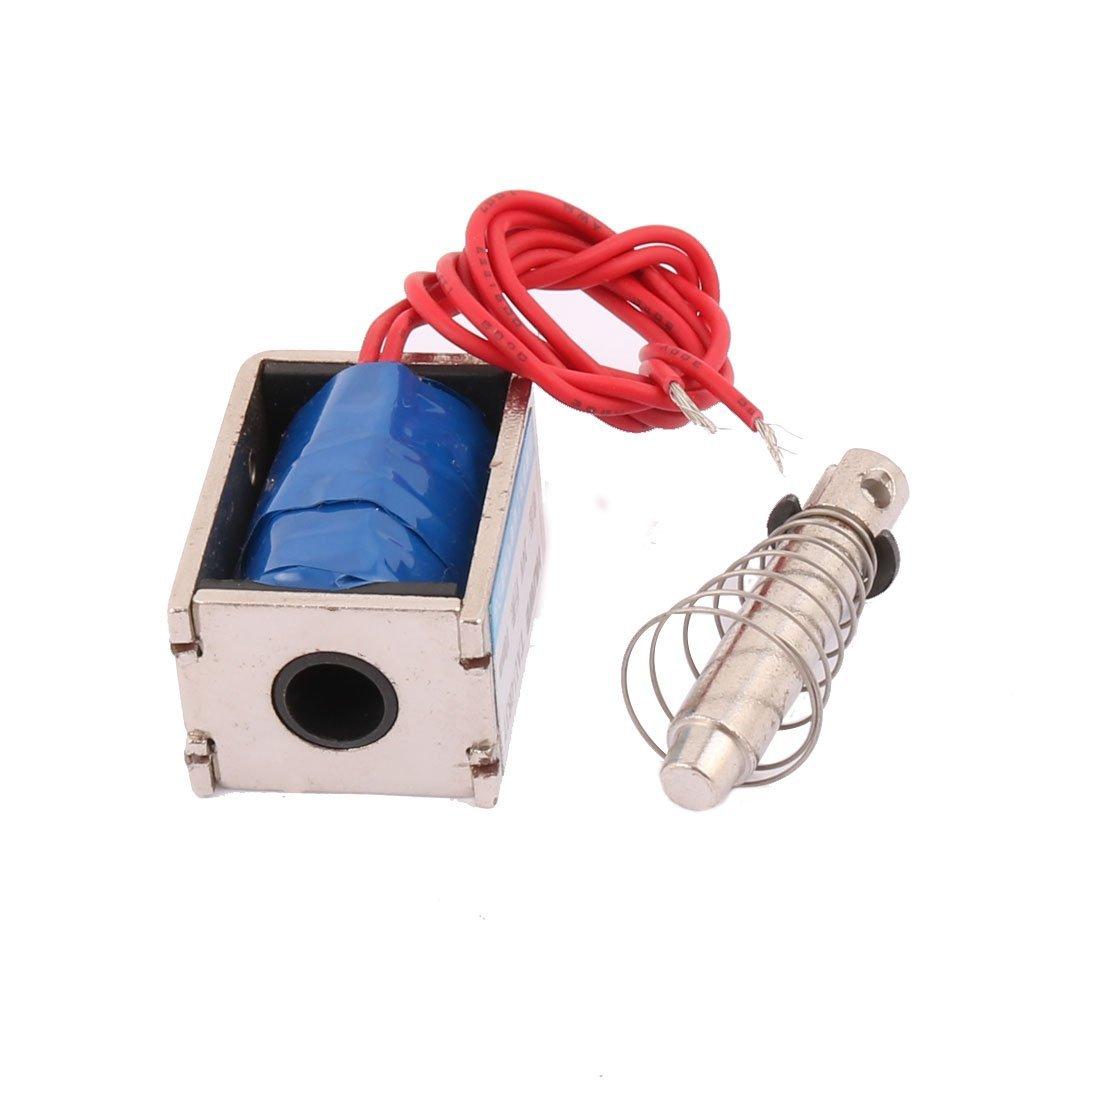 Amazon.com: eDealMax TAU-0837 DC 24V 19N Push Pull Tipo de bricolaje Marco abierto DC Solenoide imán Electroimán: Home & Kitchen